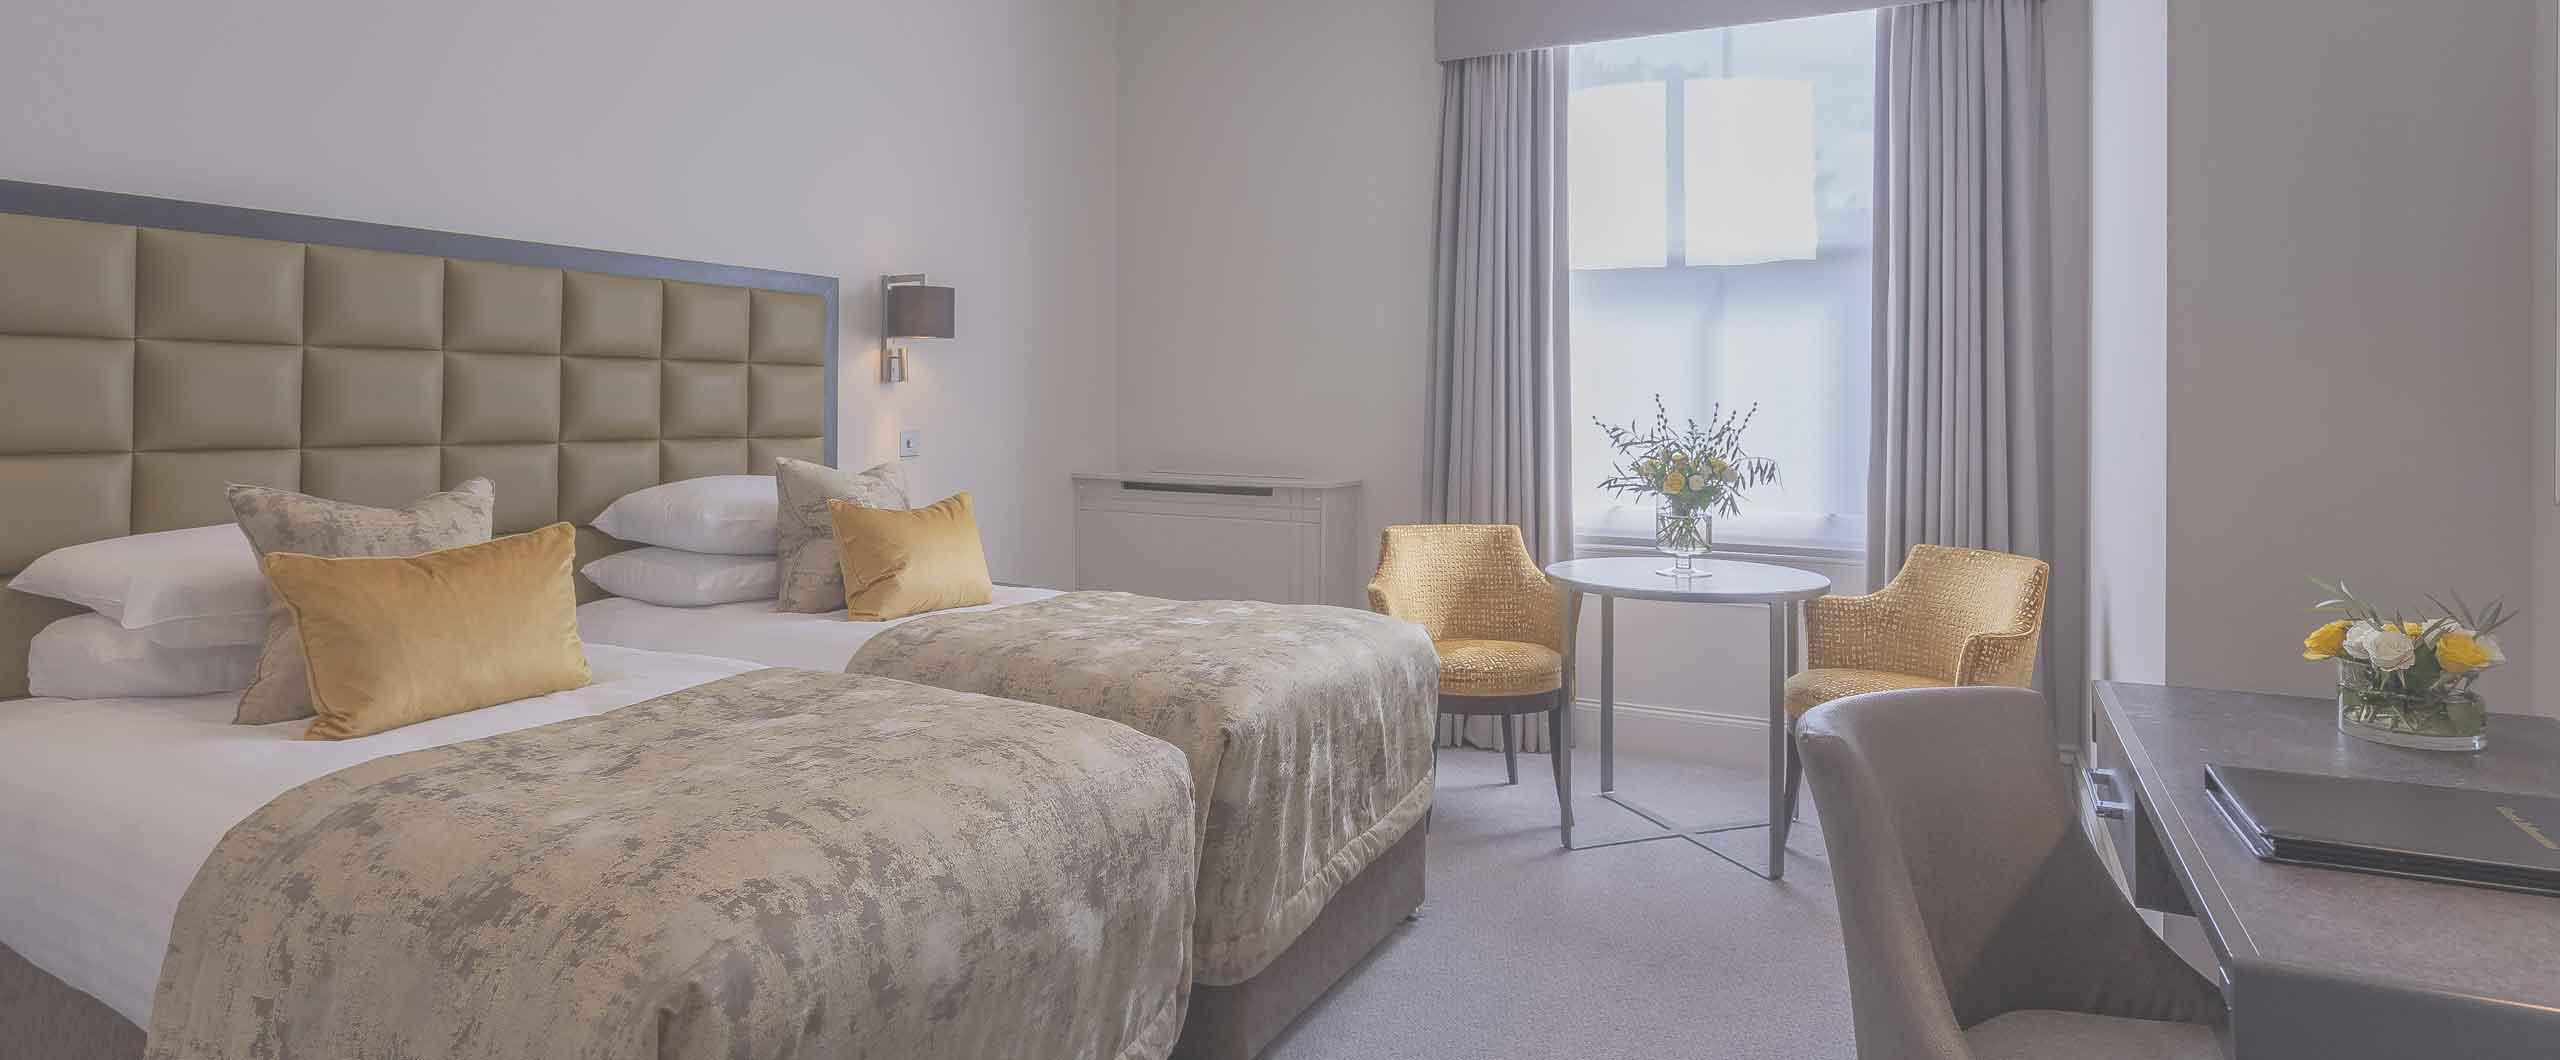 Oatlands park hotel executive room